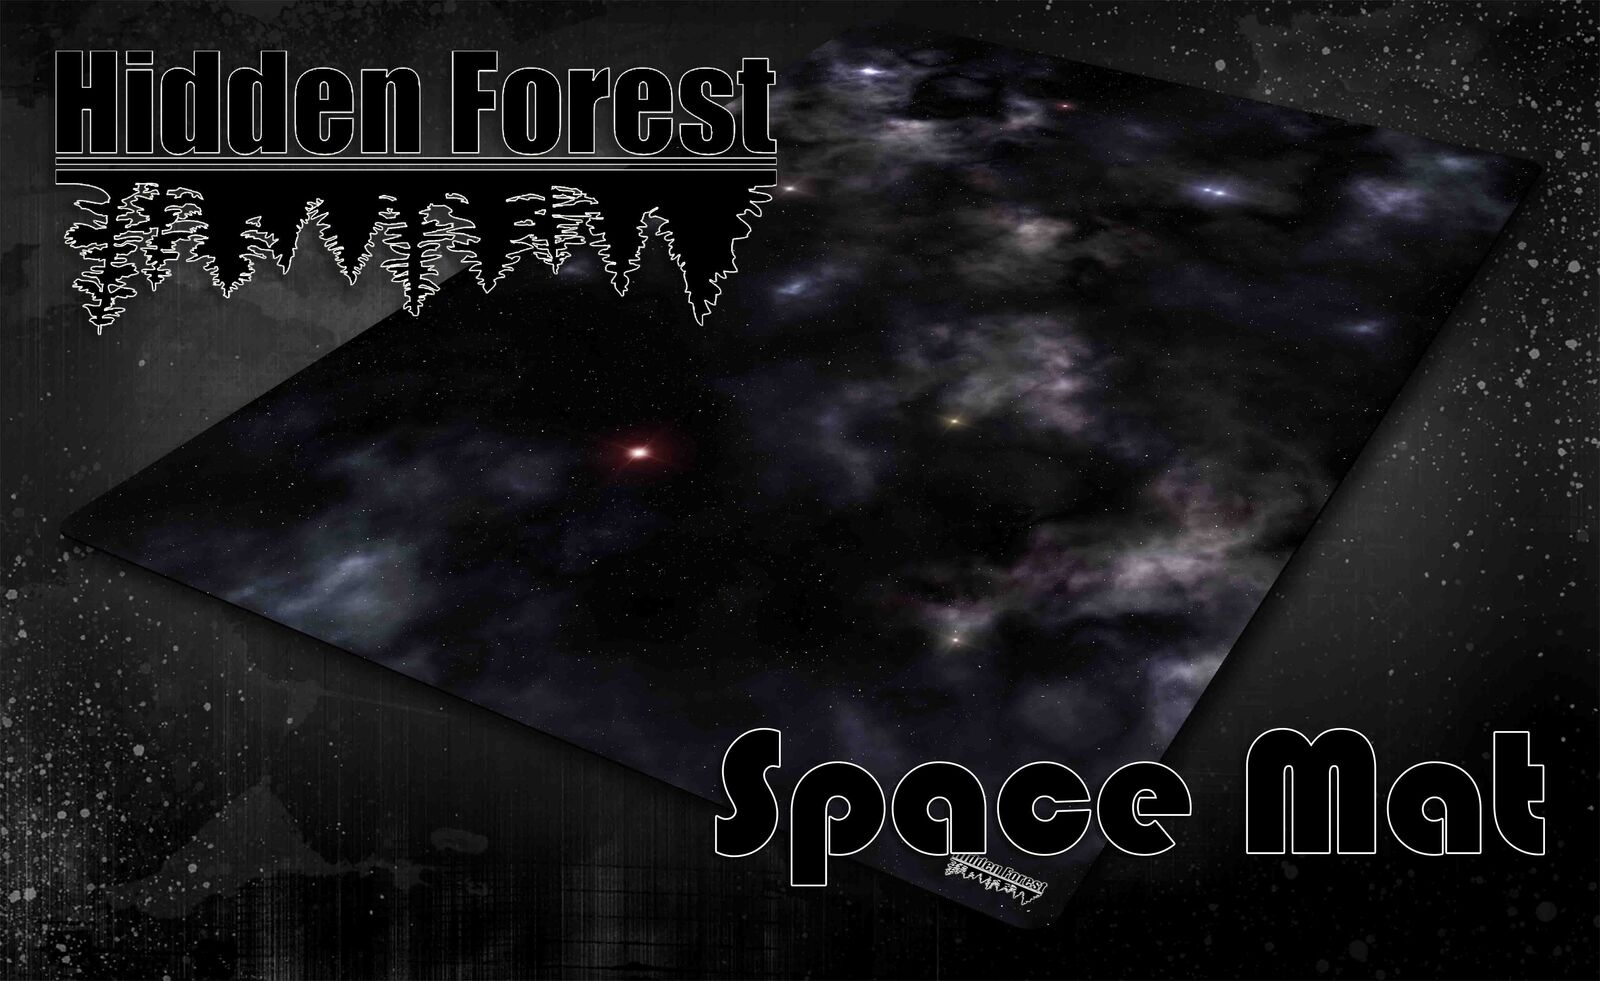 Hiddenforest raum gaming - matte für x-wing und armada (mouse pad material)